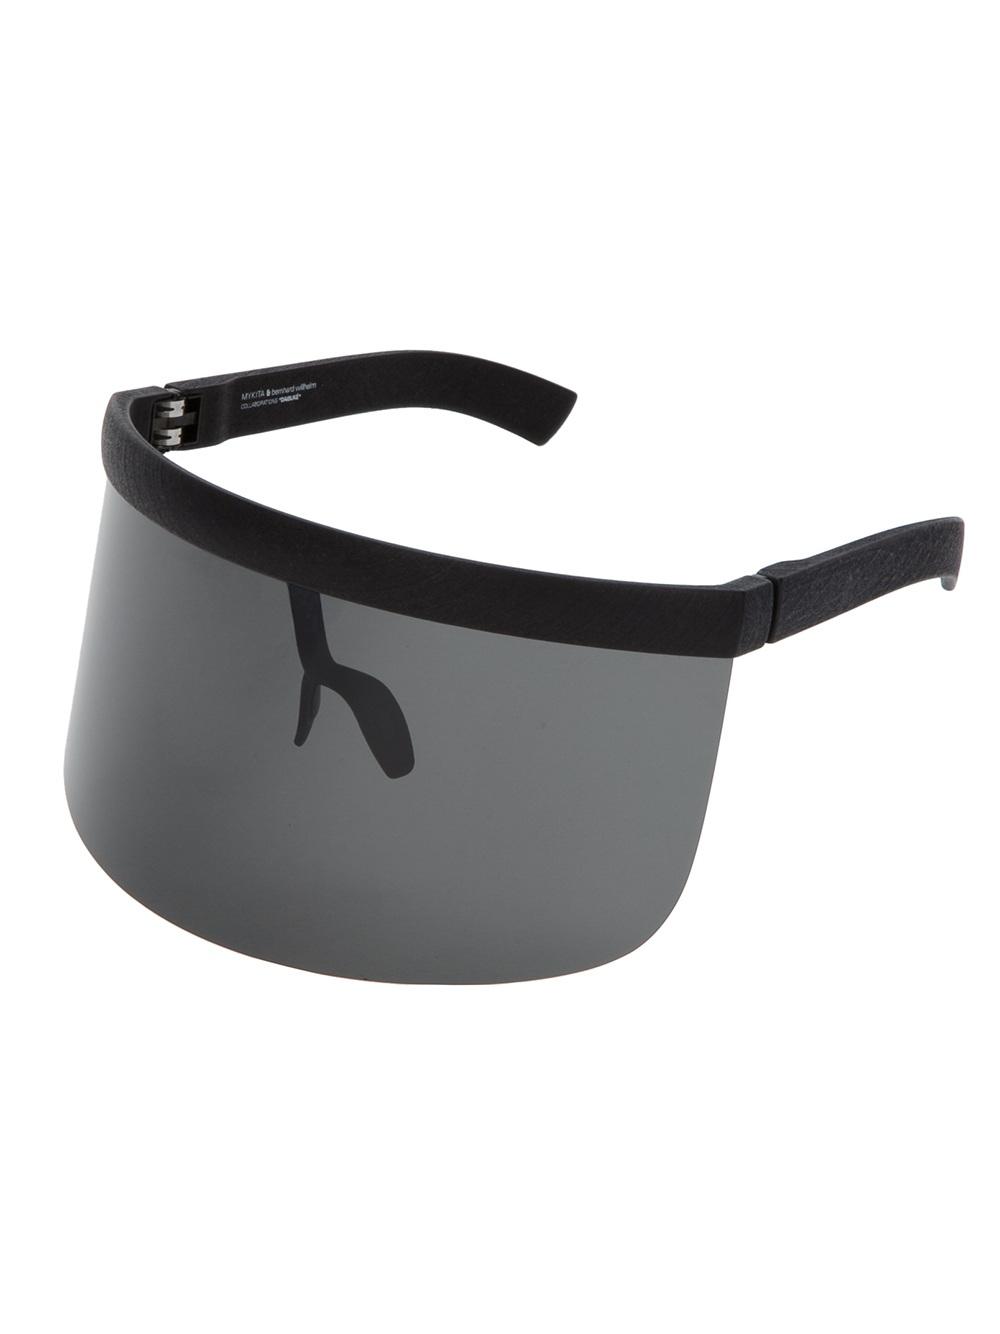 a574be6d61 Bernhard Willhelm Pitch Black Visor Sunglasses in Black - Lyst